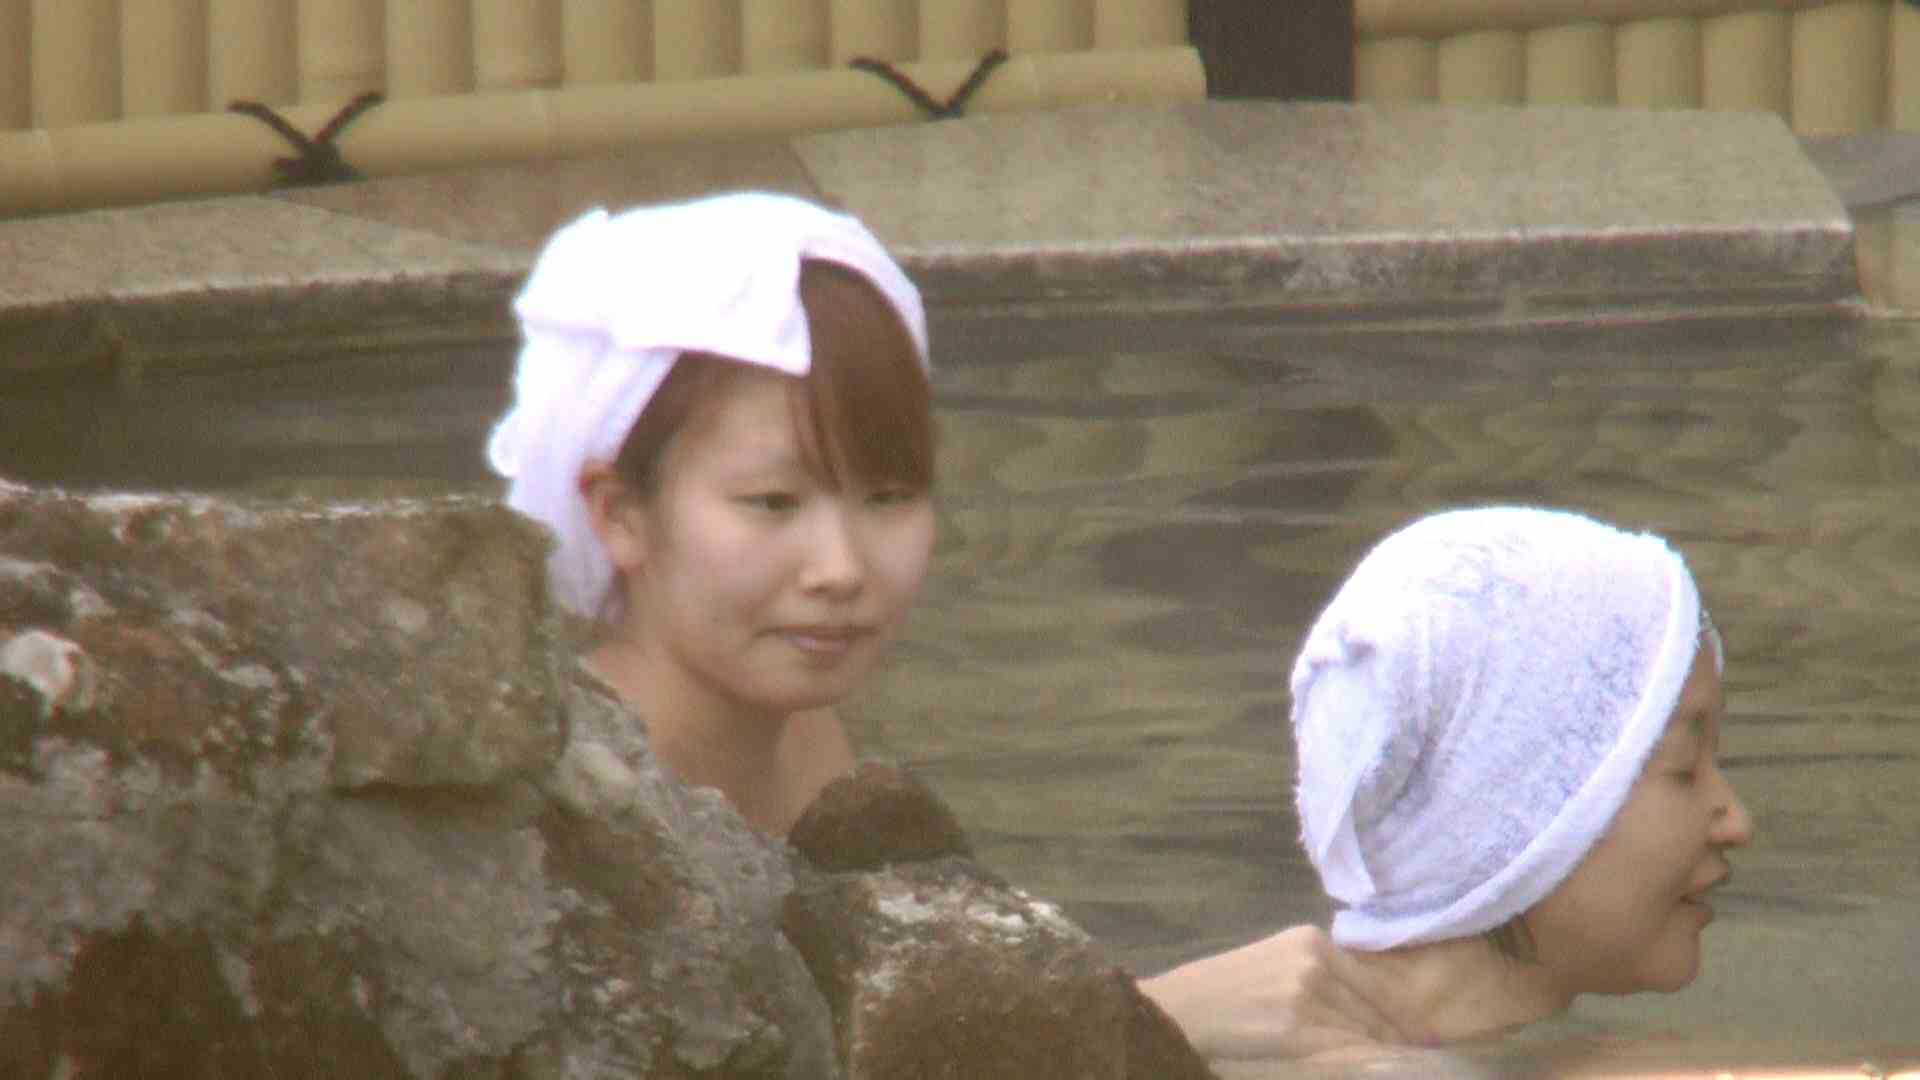 Aquaな露天風呂Vol.210 OL女体  49連発 48